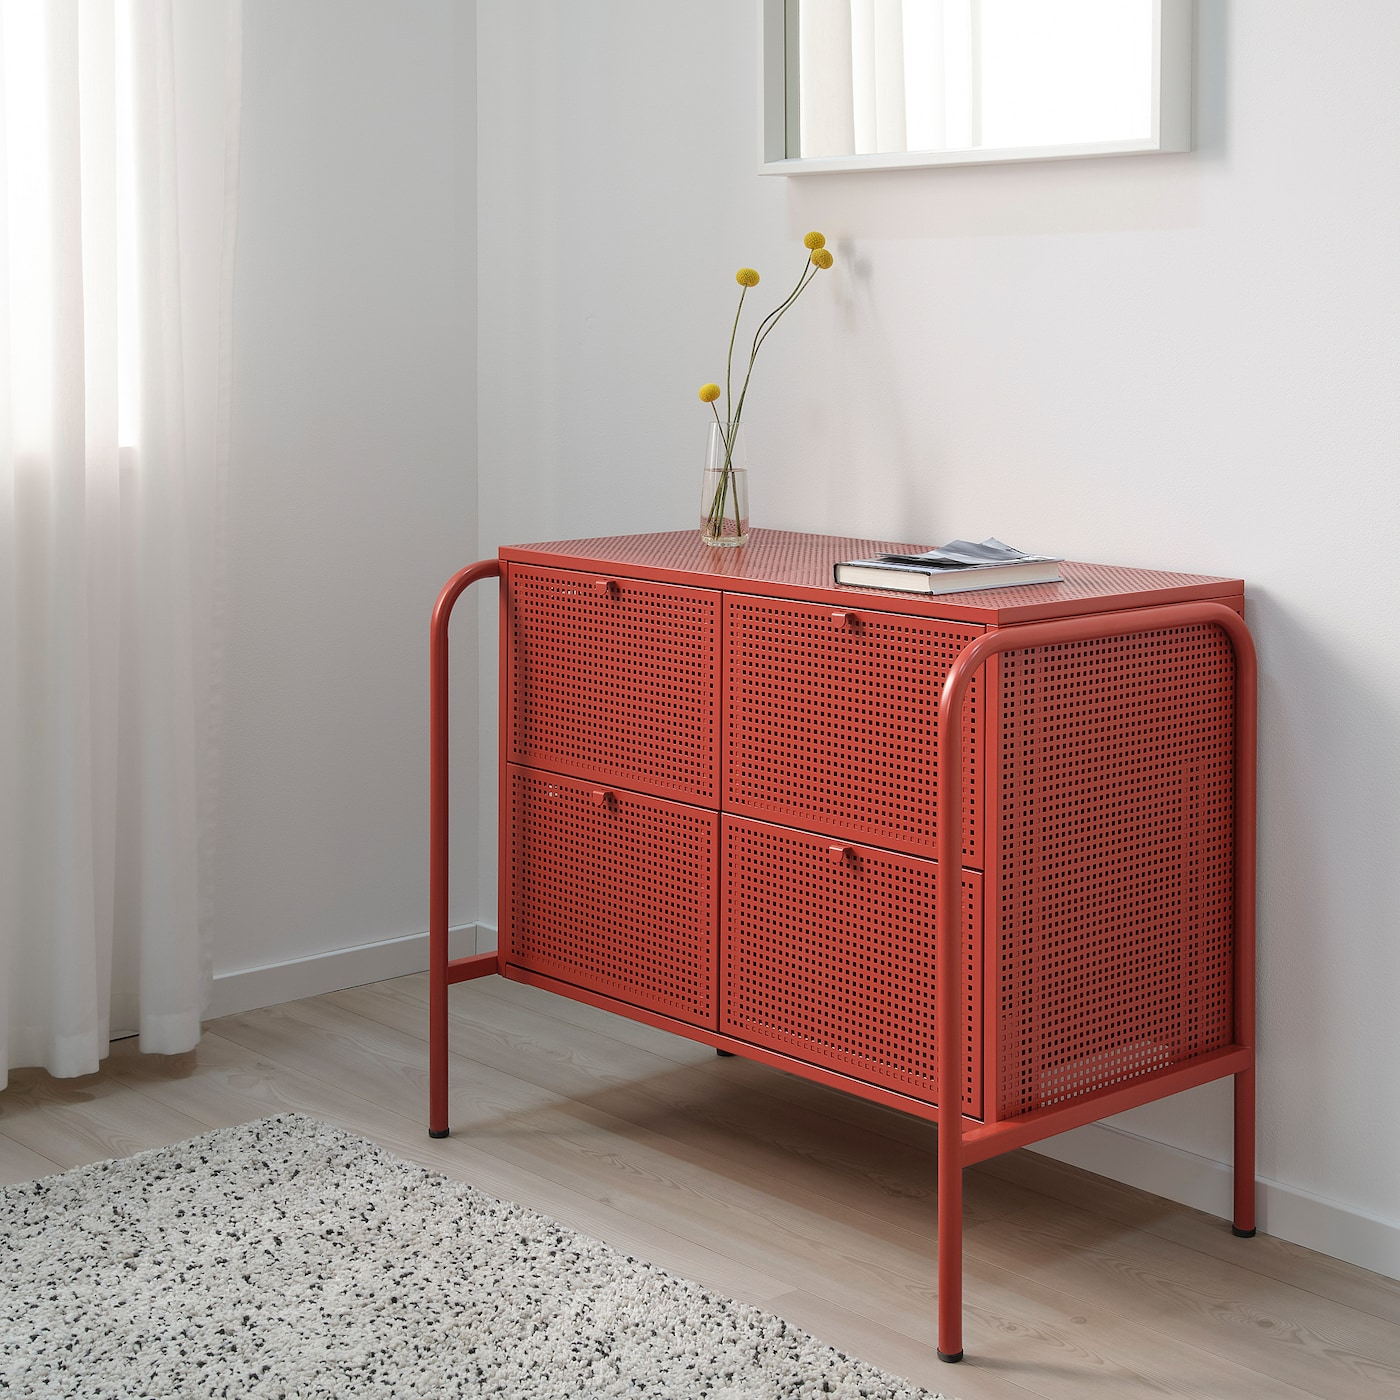 NIKKEBY 니케뷔 4칸서랍장, 레드, 84x70 cm